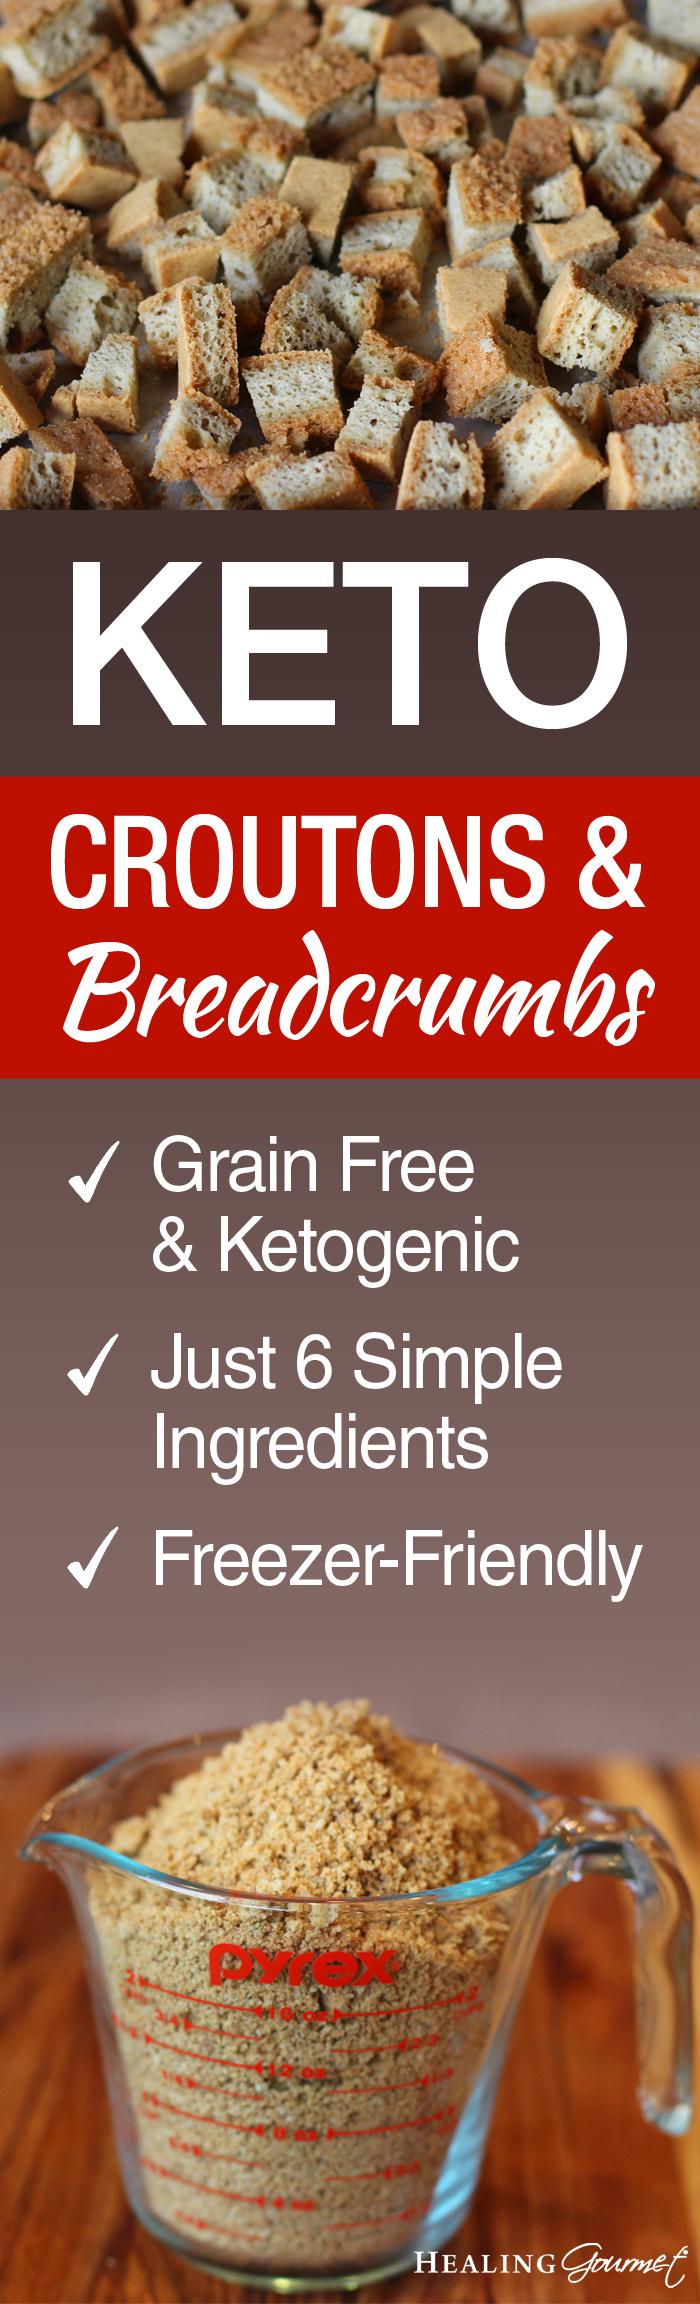 Keto Croutons & Breadcrumbs